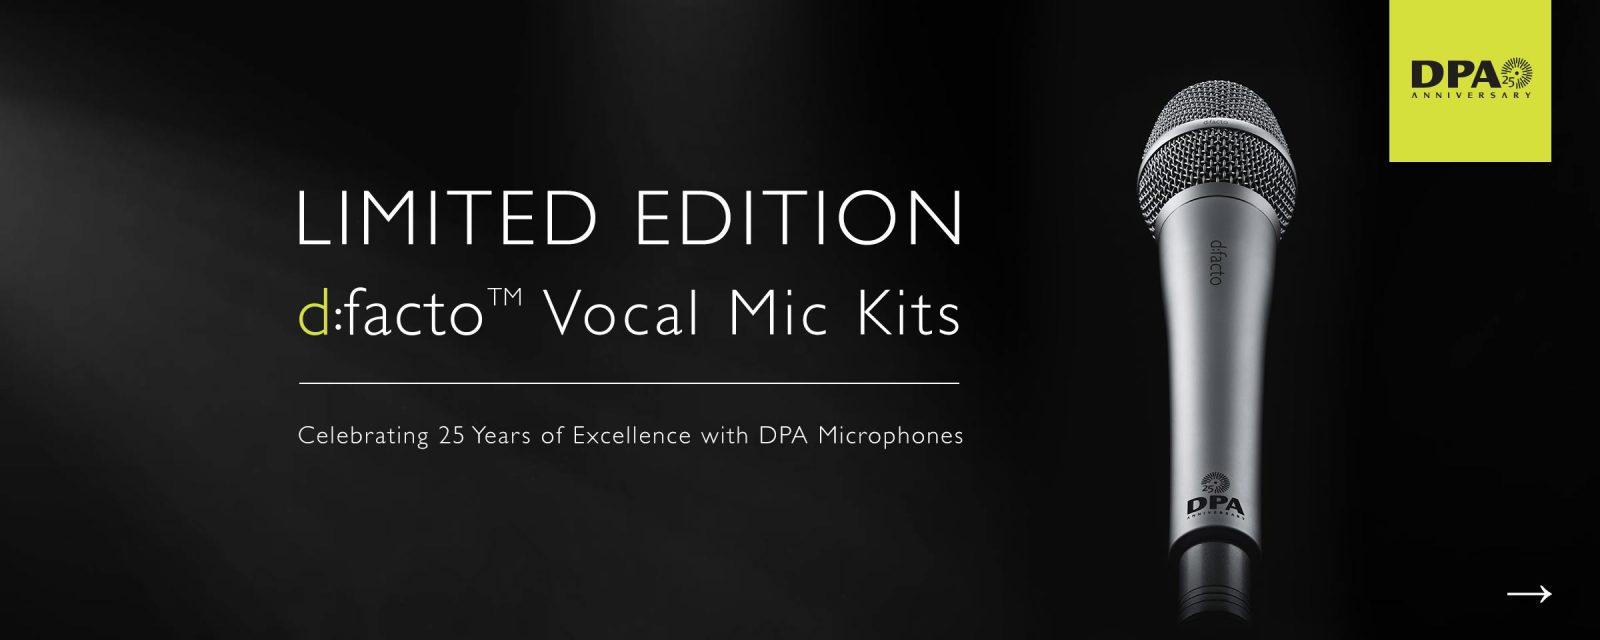 DPA d:facto™ 25th Anniversary Kits